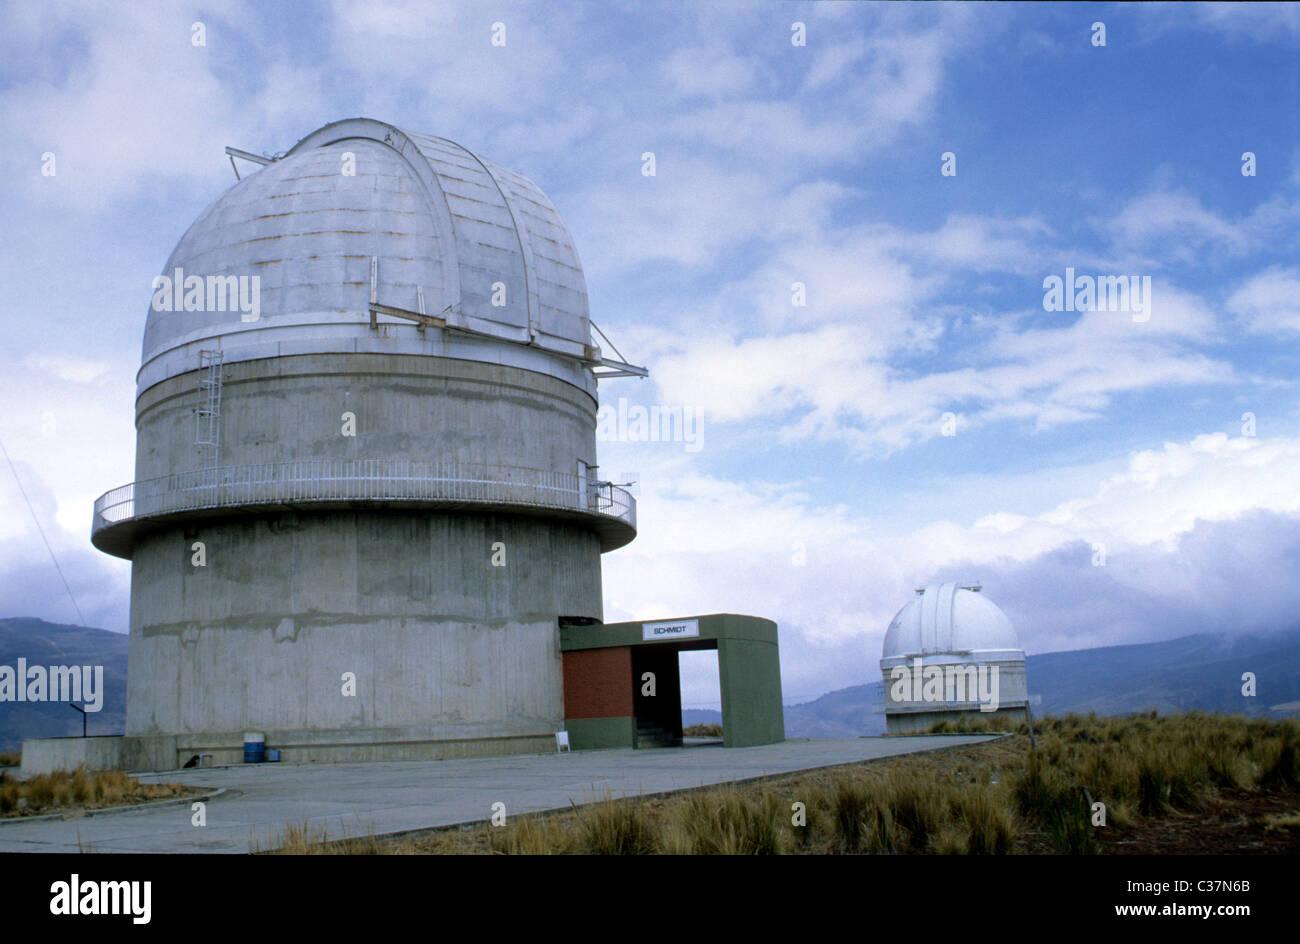 CIDA Centro de Investigaciones de Astronomia, Observatory, Venezuela - Stock Image